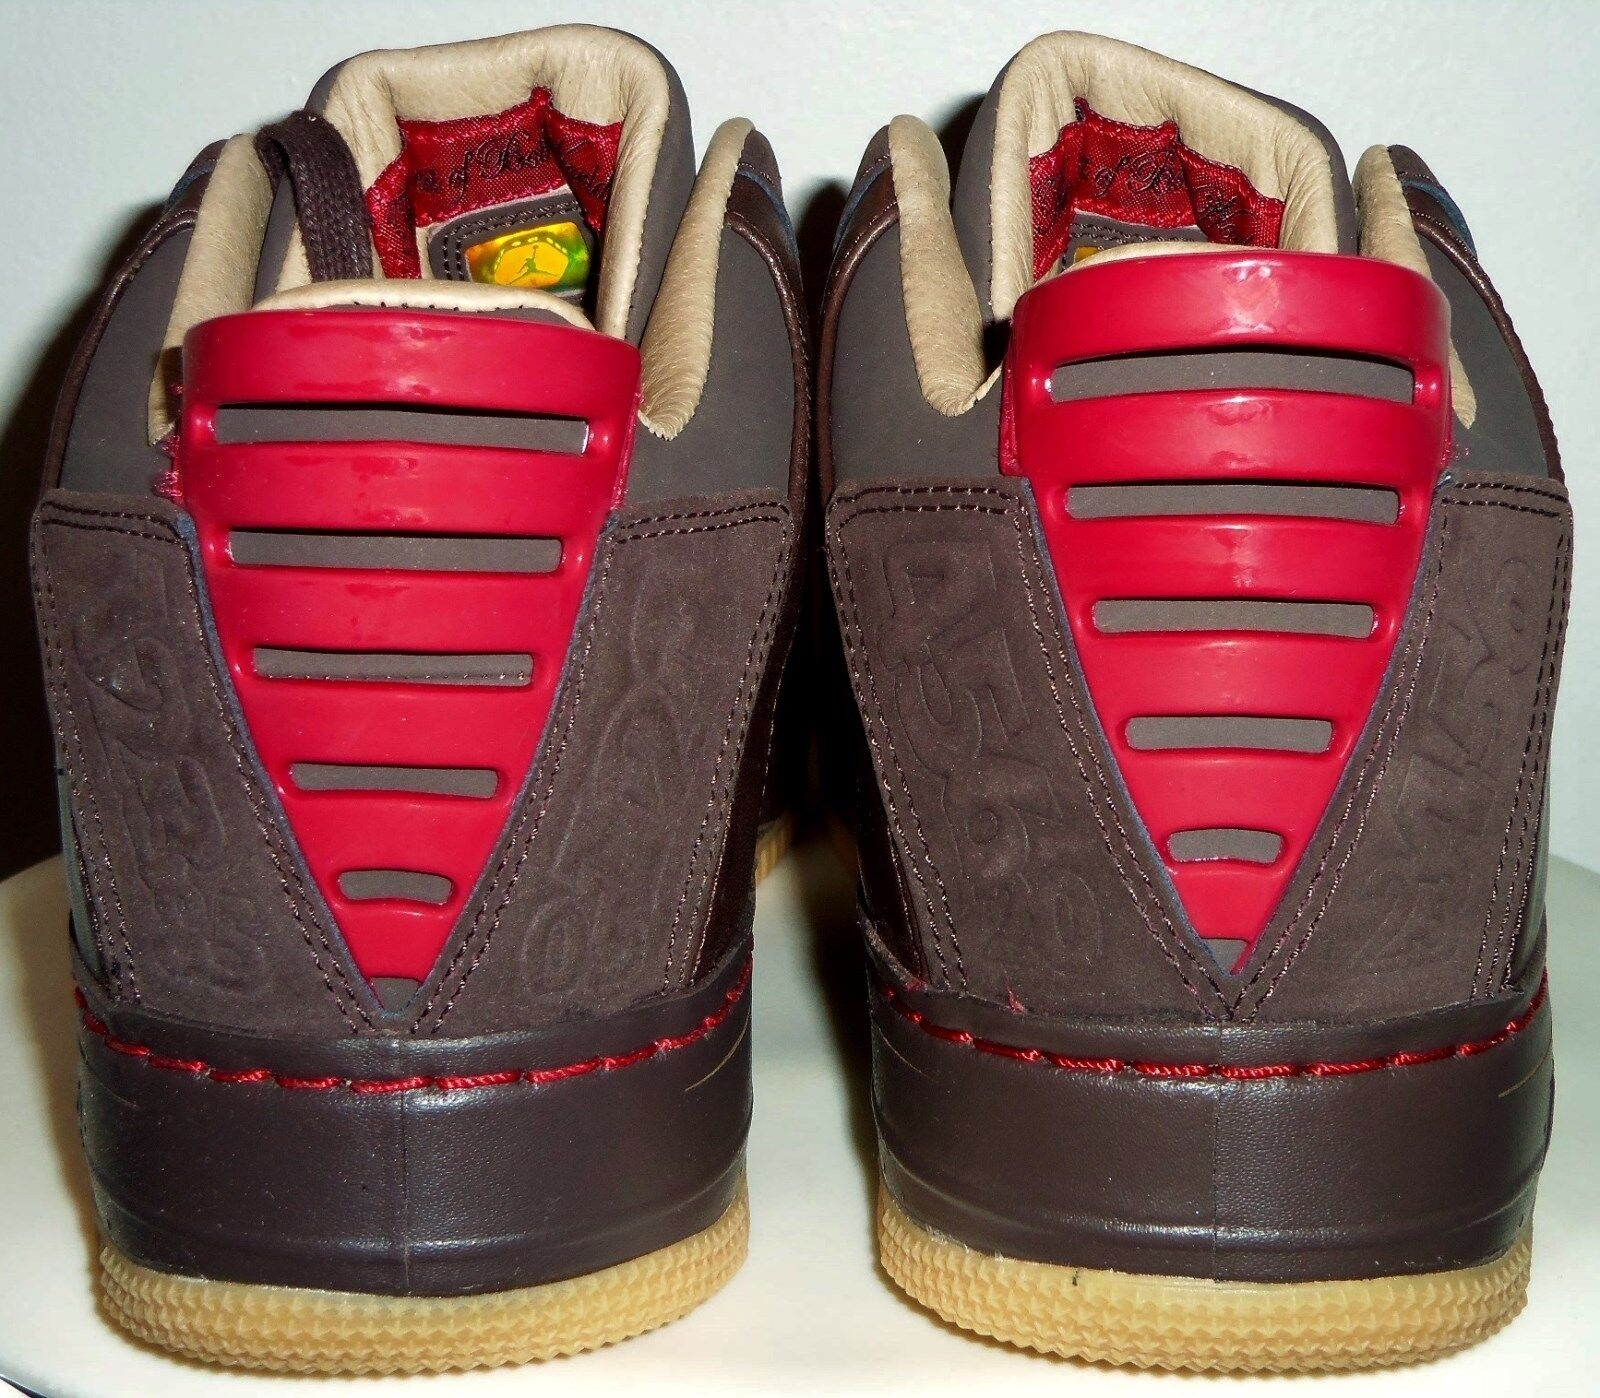 NEW NEW NEW 2008 NIKE AIR JORDAN AJF 20 LOW LS (DRK CINDER  VAR RED) SHOES 11.5 W  BOX 8a7d30